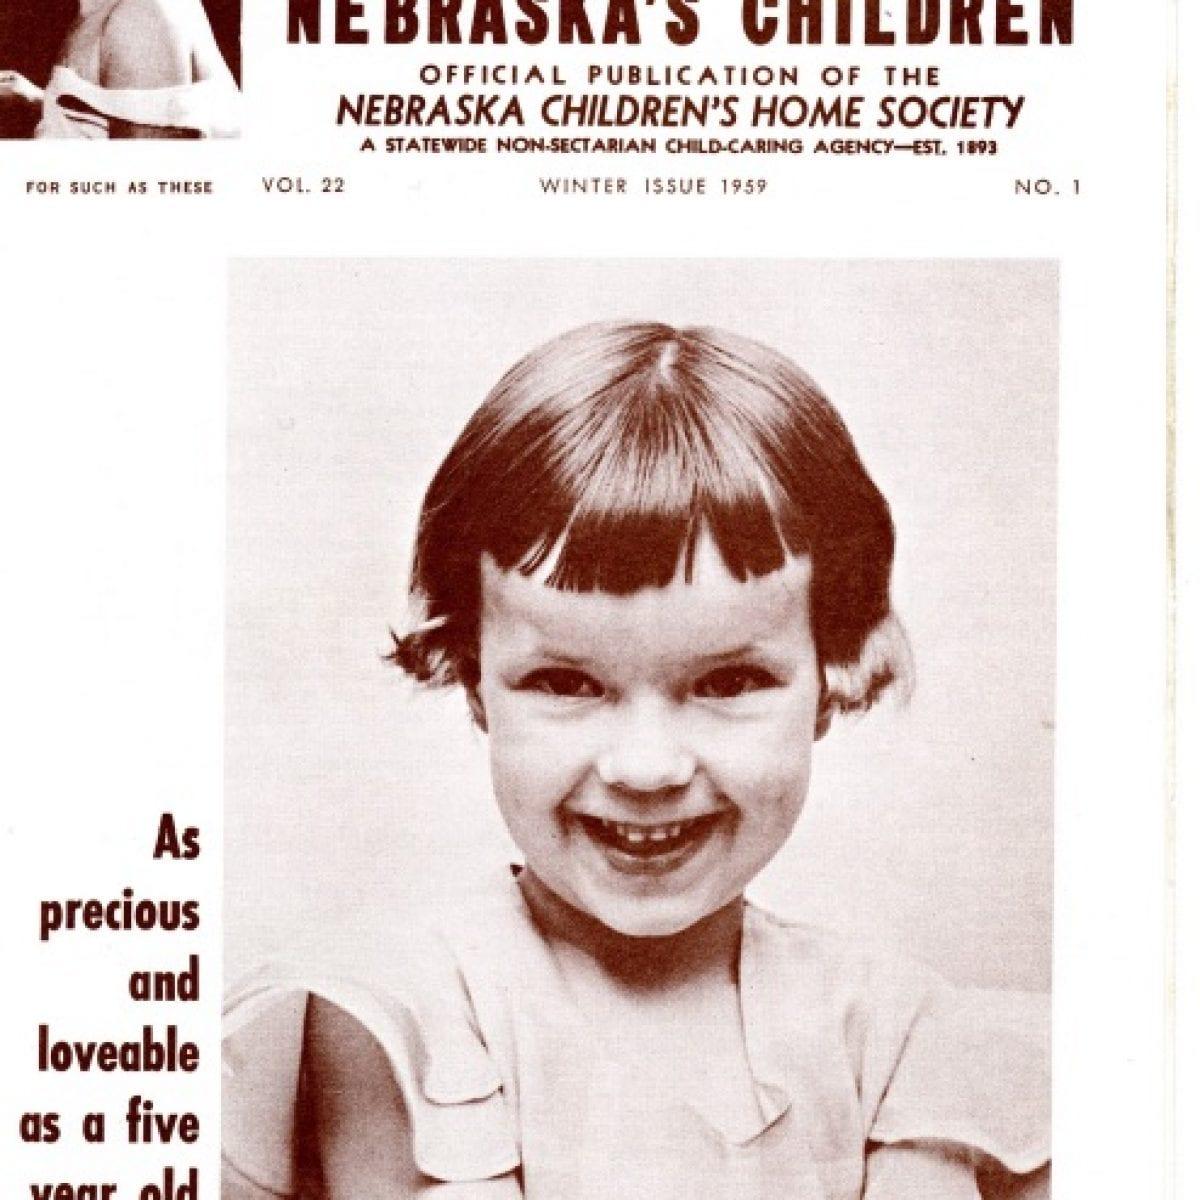 1938 – Nebraska's Children magazine publication replaces The Advocate